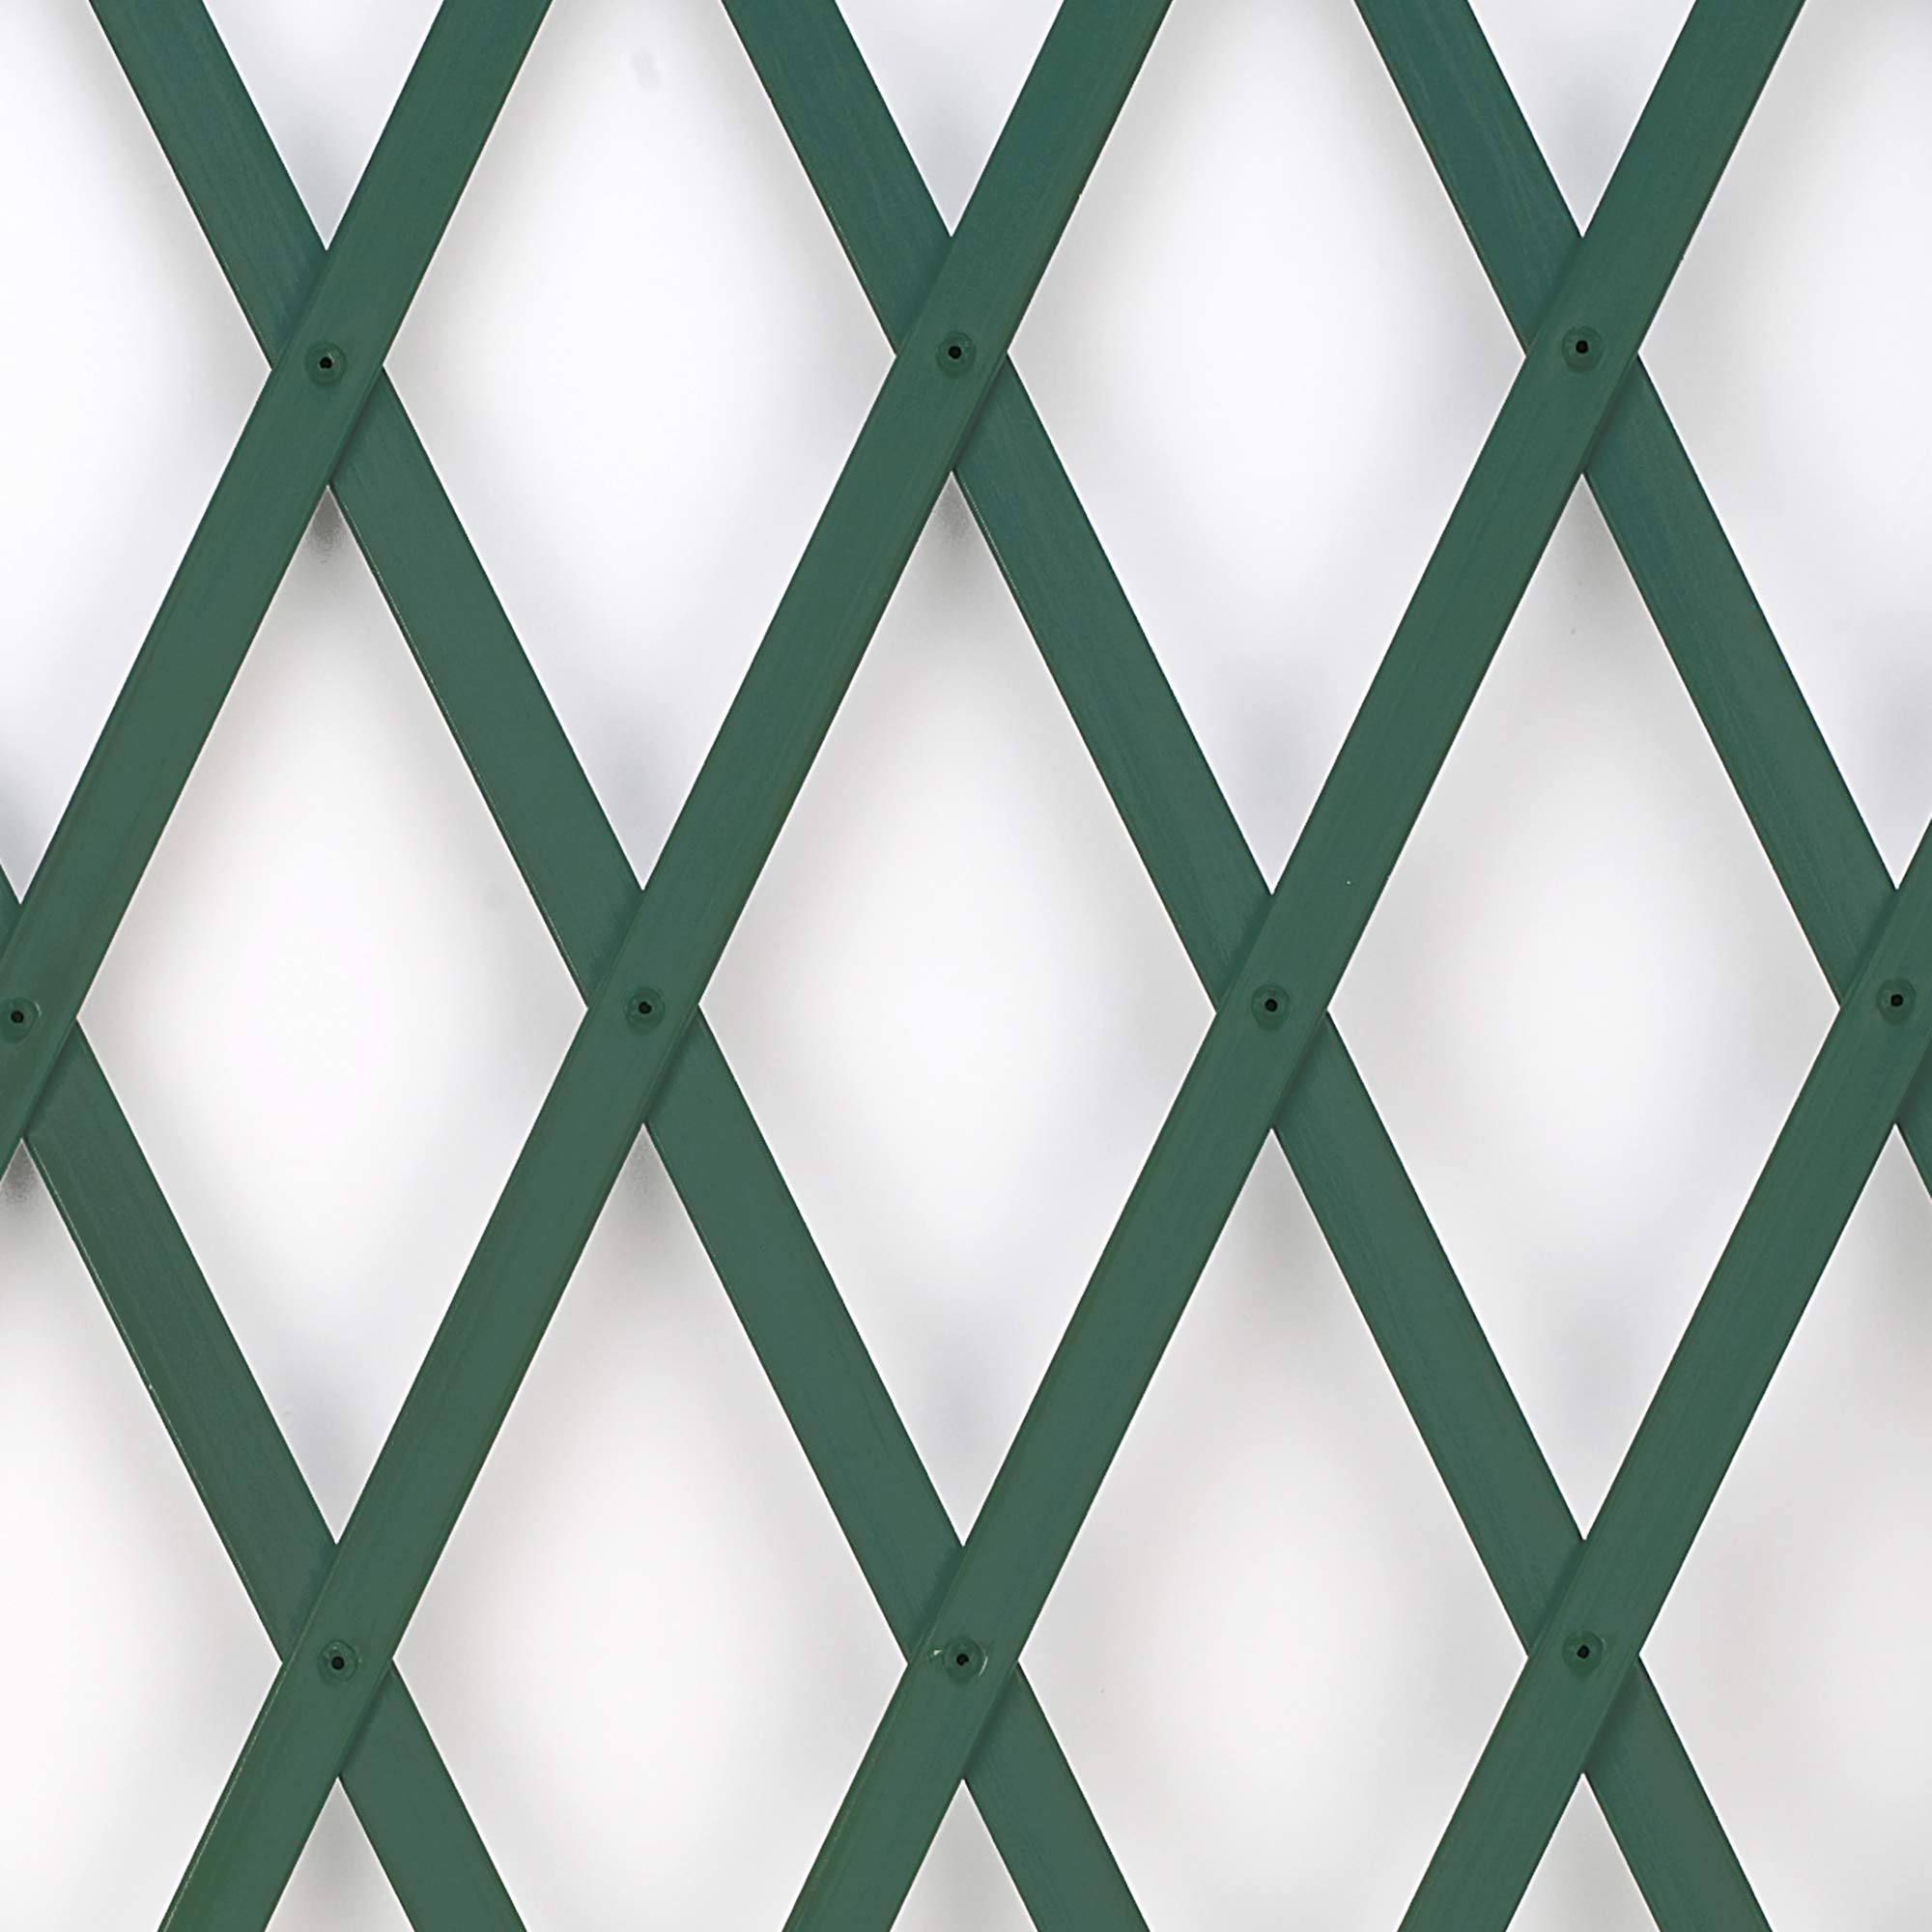 GREEN EXPANDING PVC GARDEN TRELLIS 1.8M X 40CM UK 9 X